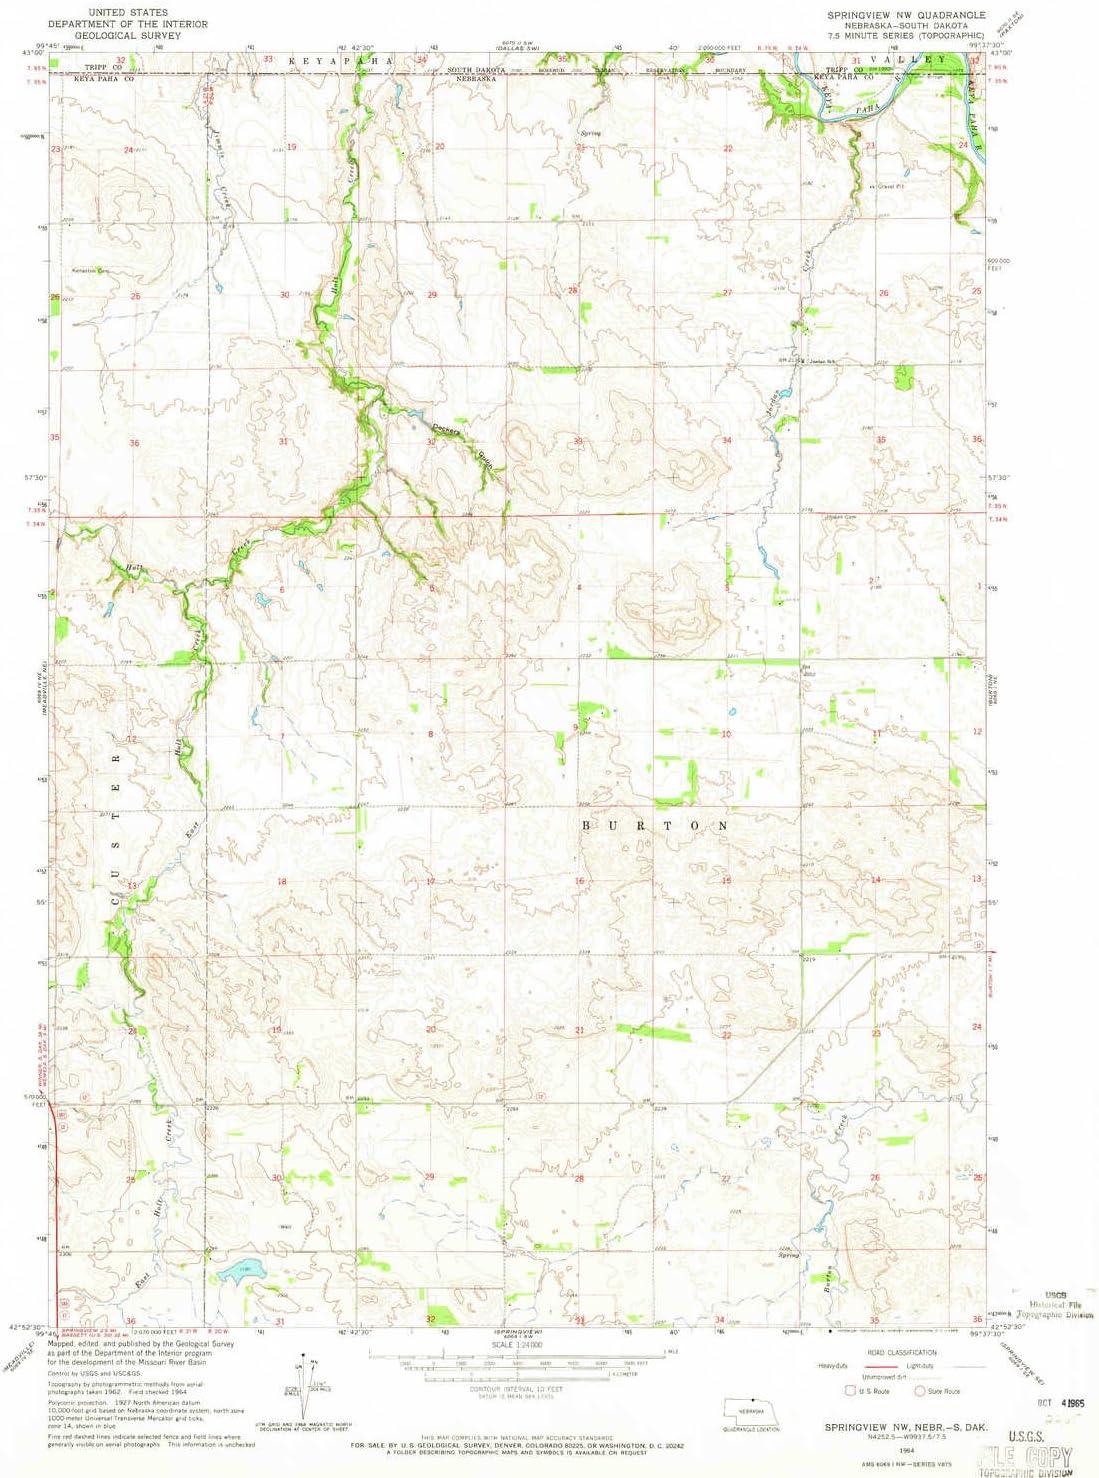 Ranking TOP13 YellowMaps Springview NW NE topo Bargain map X 1:24000 7.5 Scale M